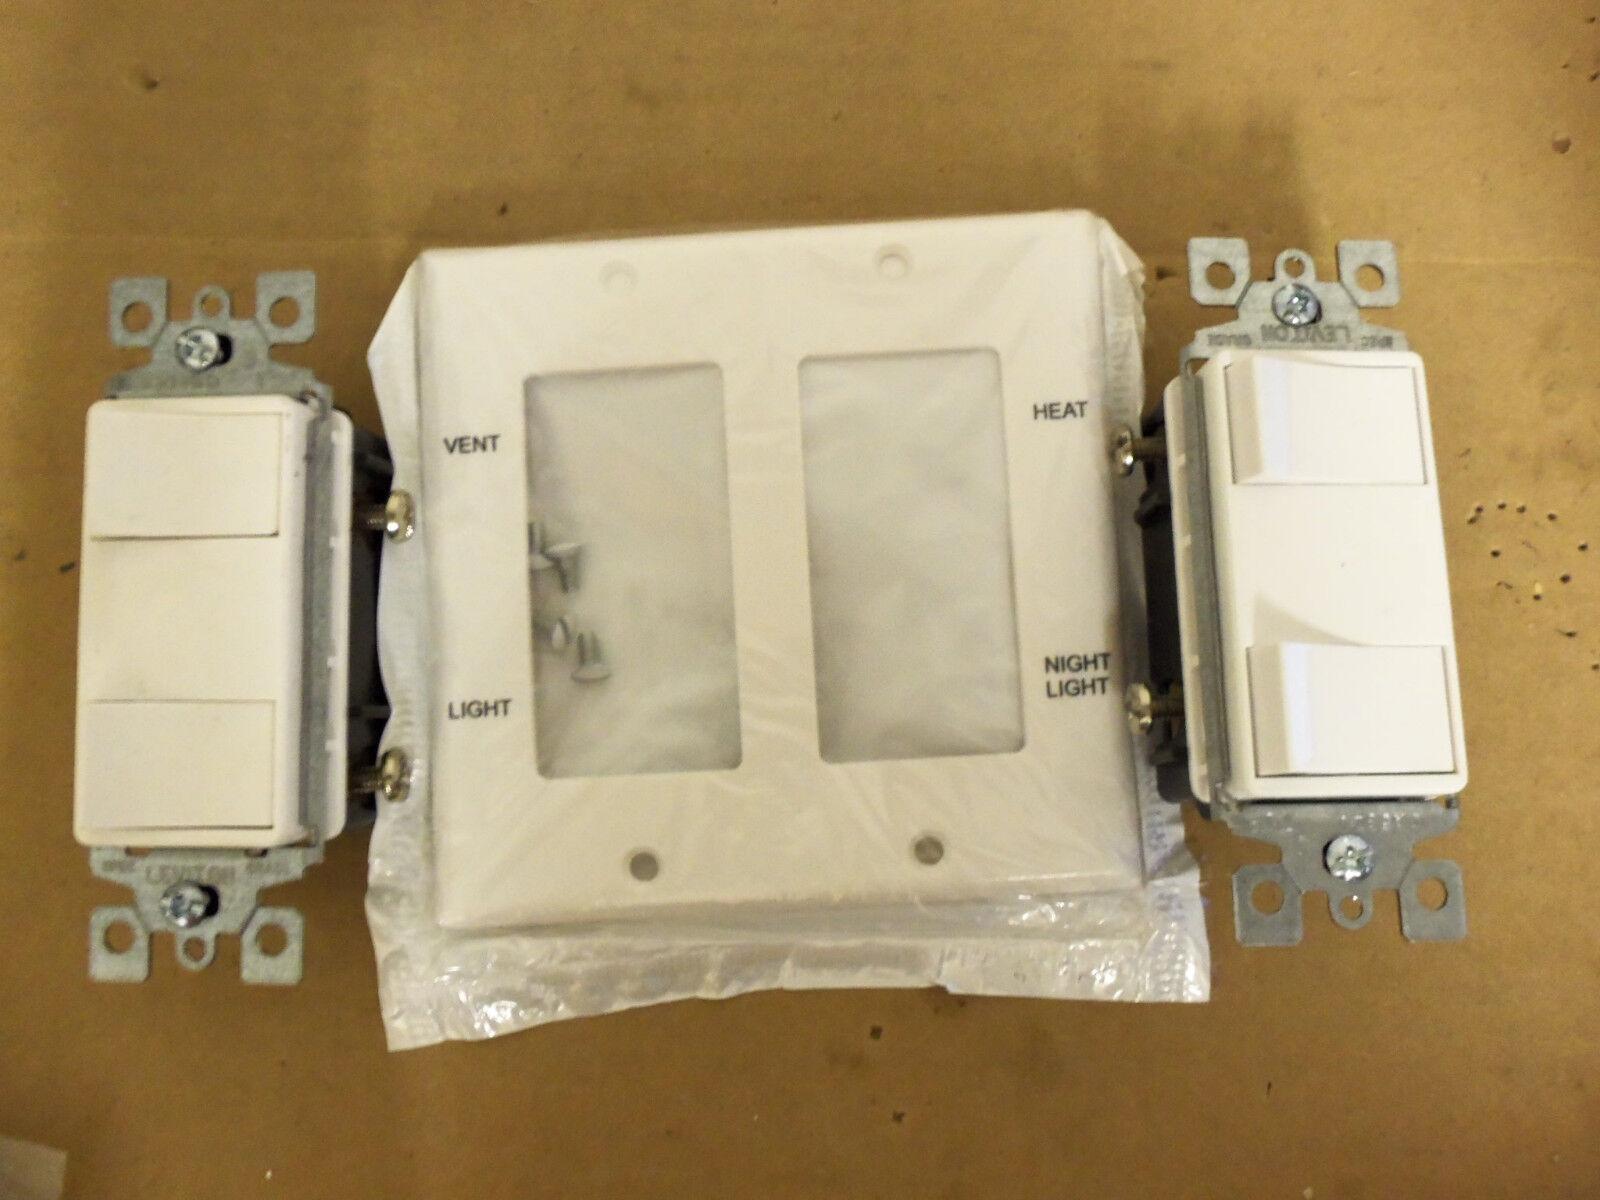 Leviton 2 Gang Wall Plate 405 80409 With Switches Ebay White Decora Triple Rocker Light Switch Triplex 15a 1755